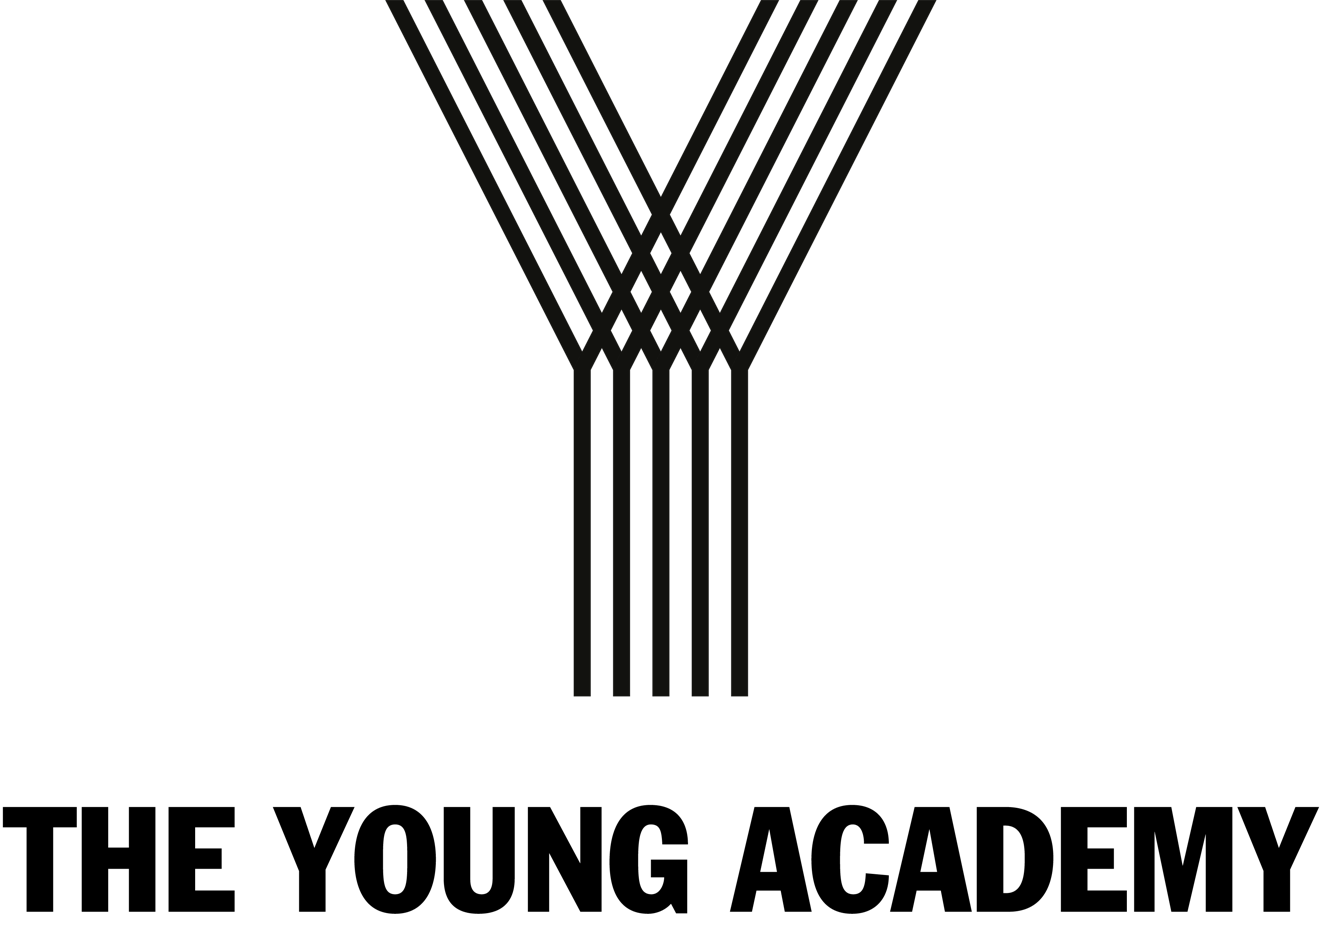 Copy of Copy of YAlogo_transparent.png